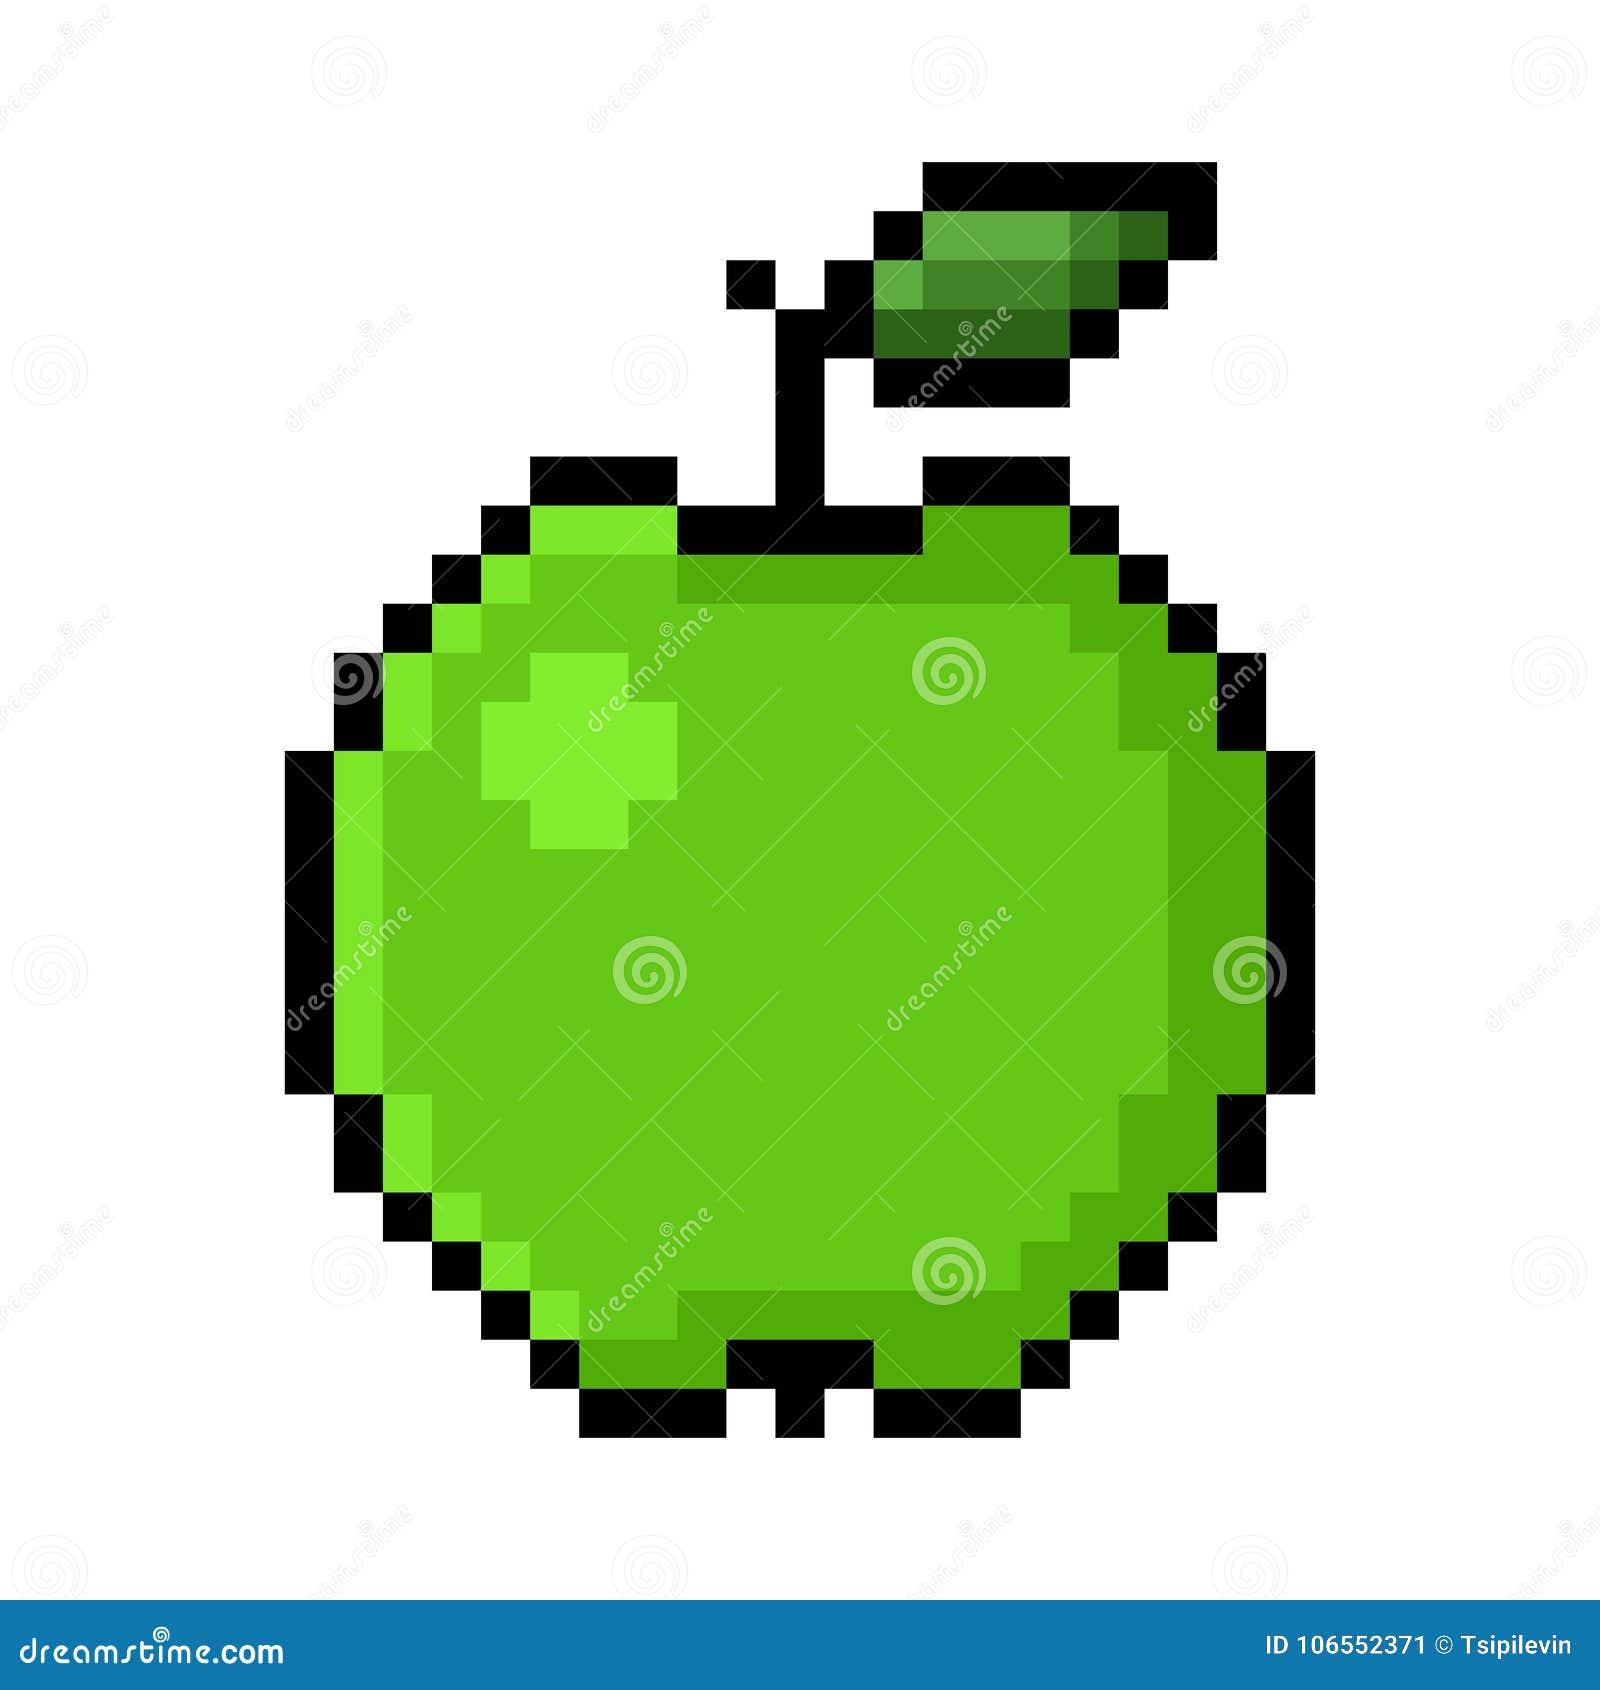 green-apple-pixel-art-big-pixels-white-background-106552371 Pixel Art Apple @koolgadgetz.com.info